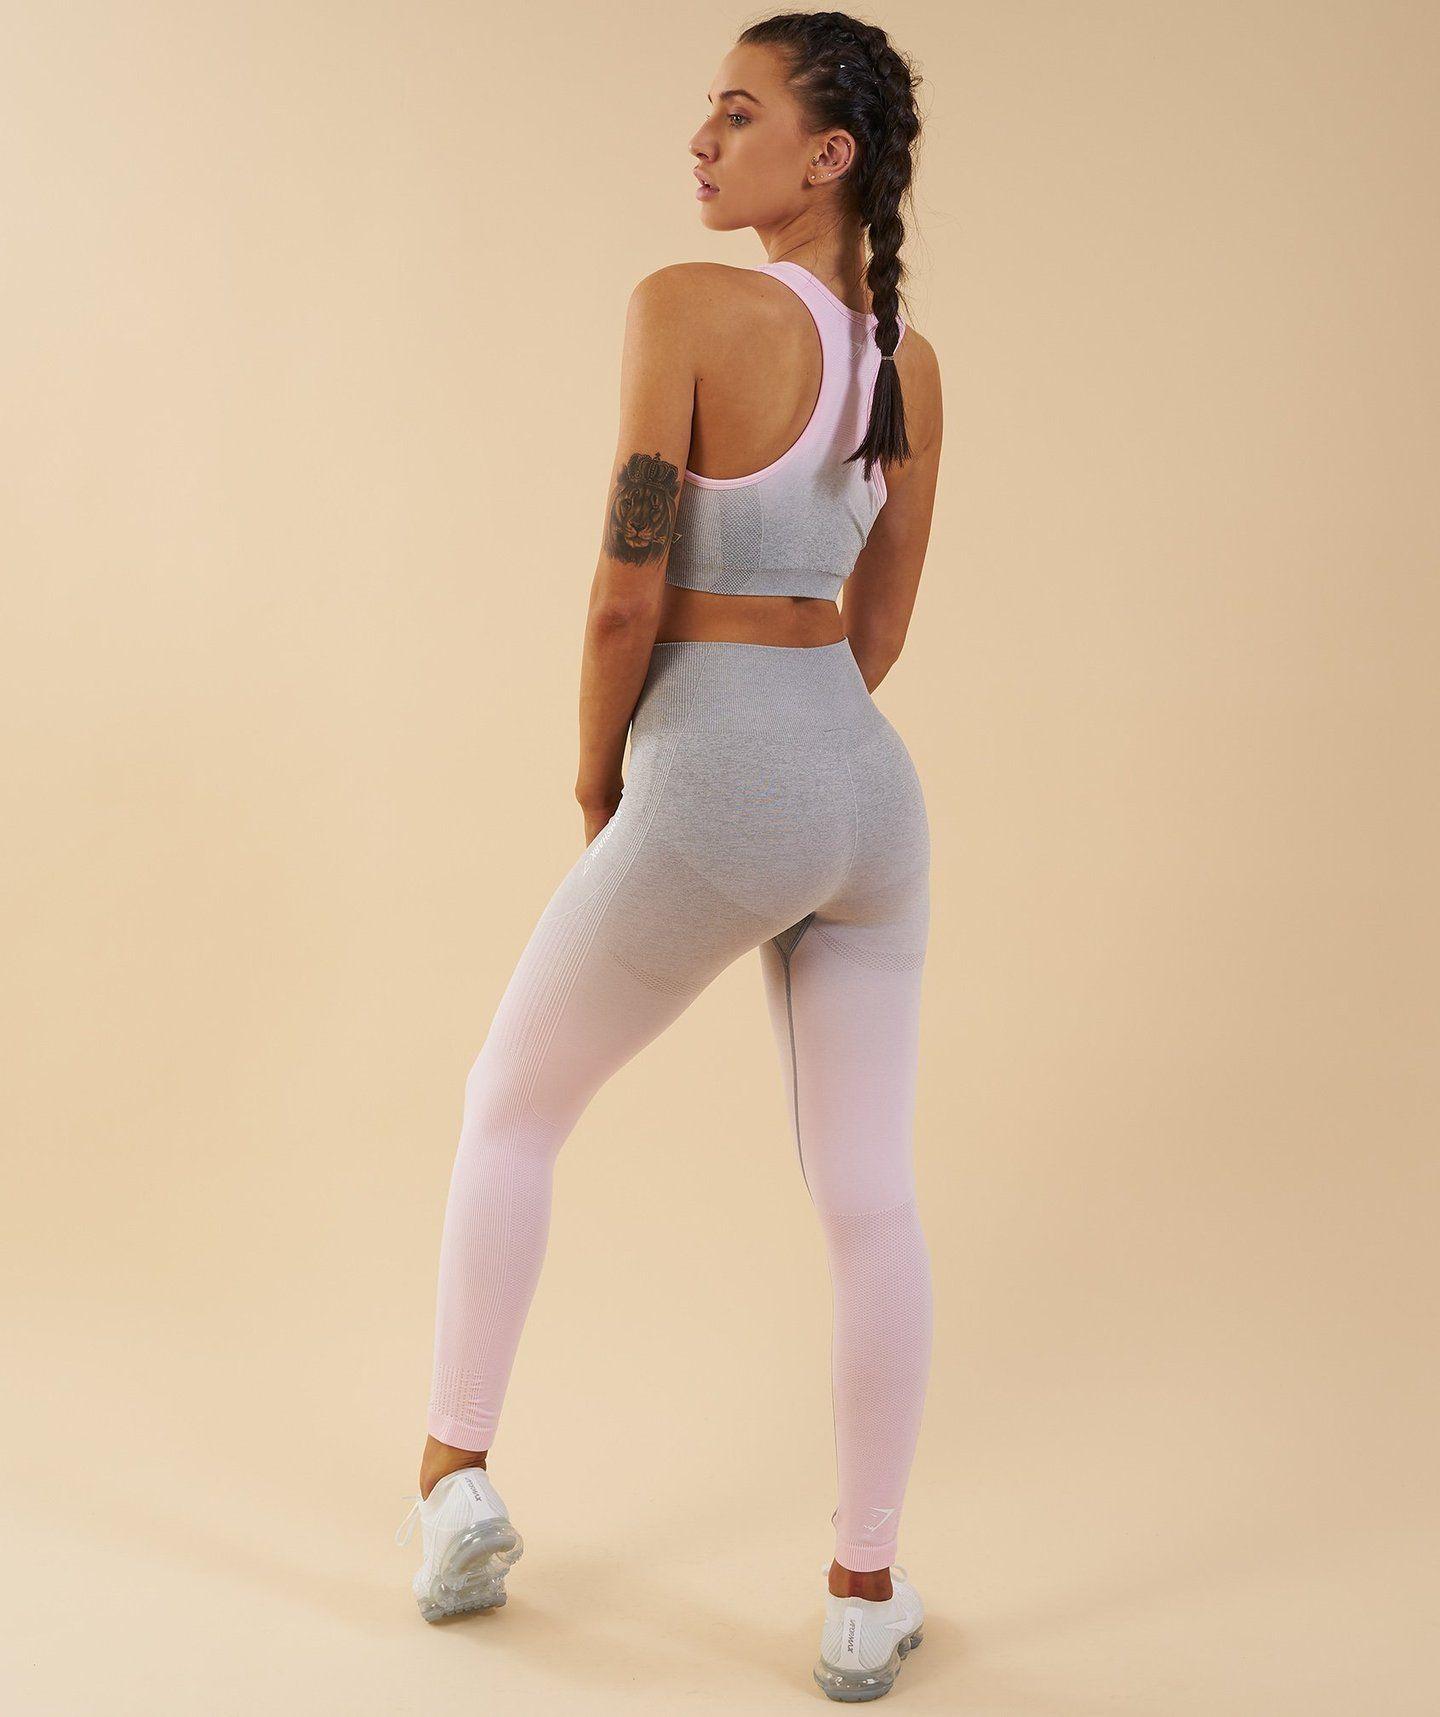 895e192a8d755 Gymshark Ombre Seamless Leggings - Light Grey/Chalk Pink | Fashion ...